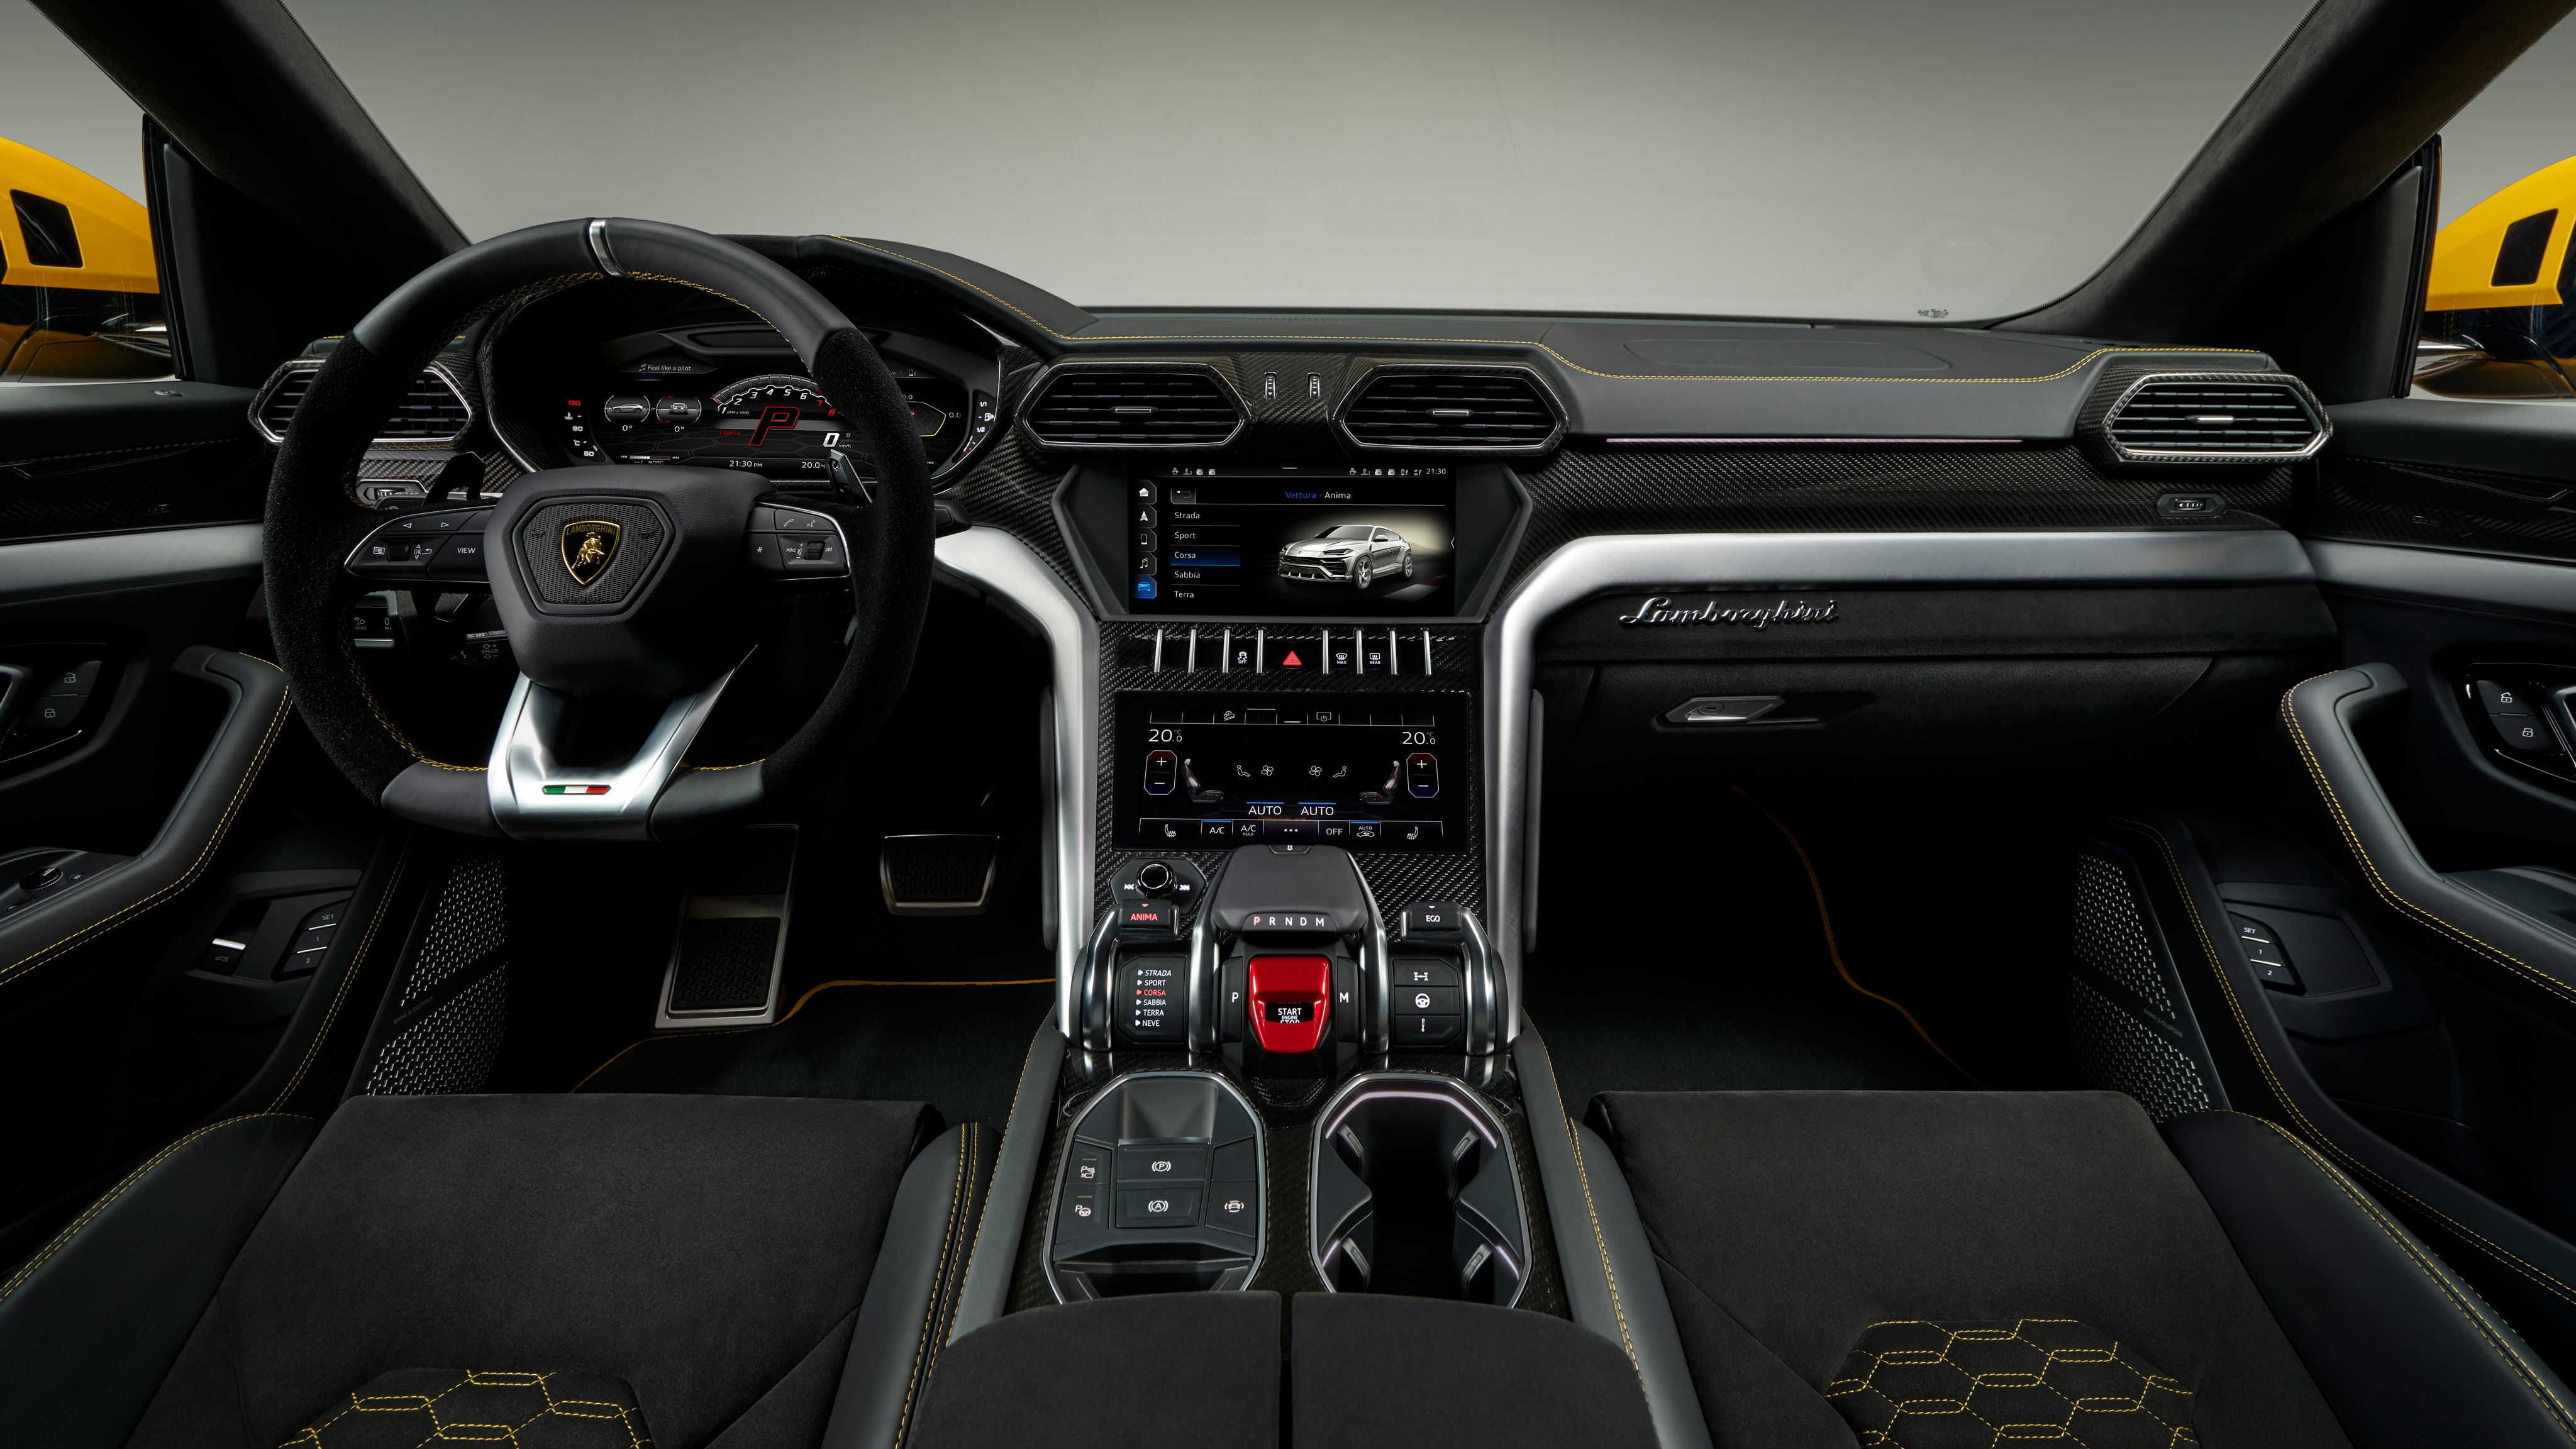 2018 Lamborghini Urus Interior 4k Wallpaper Hd Car Wallpapers Id 9219 Lamborghini Urus Interior Lamborghini Interior Truck Interior